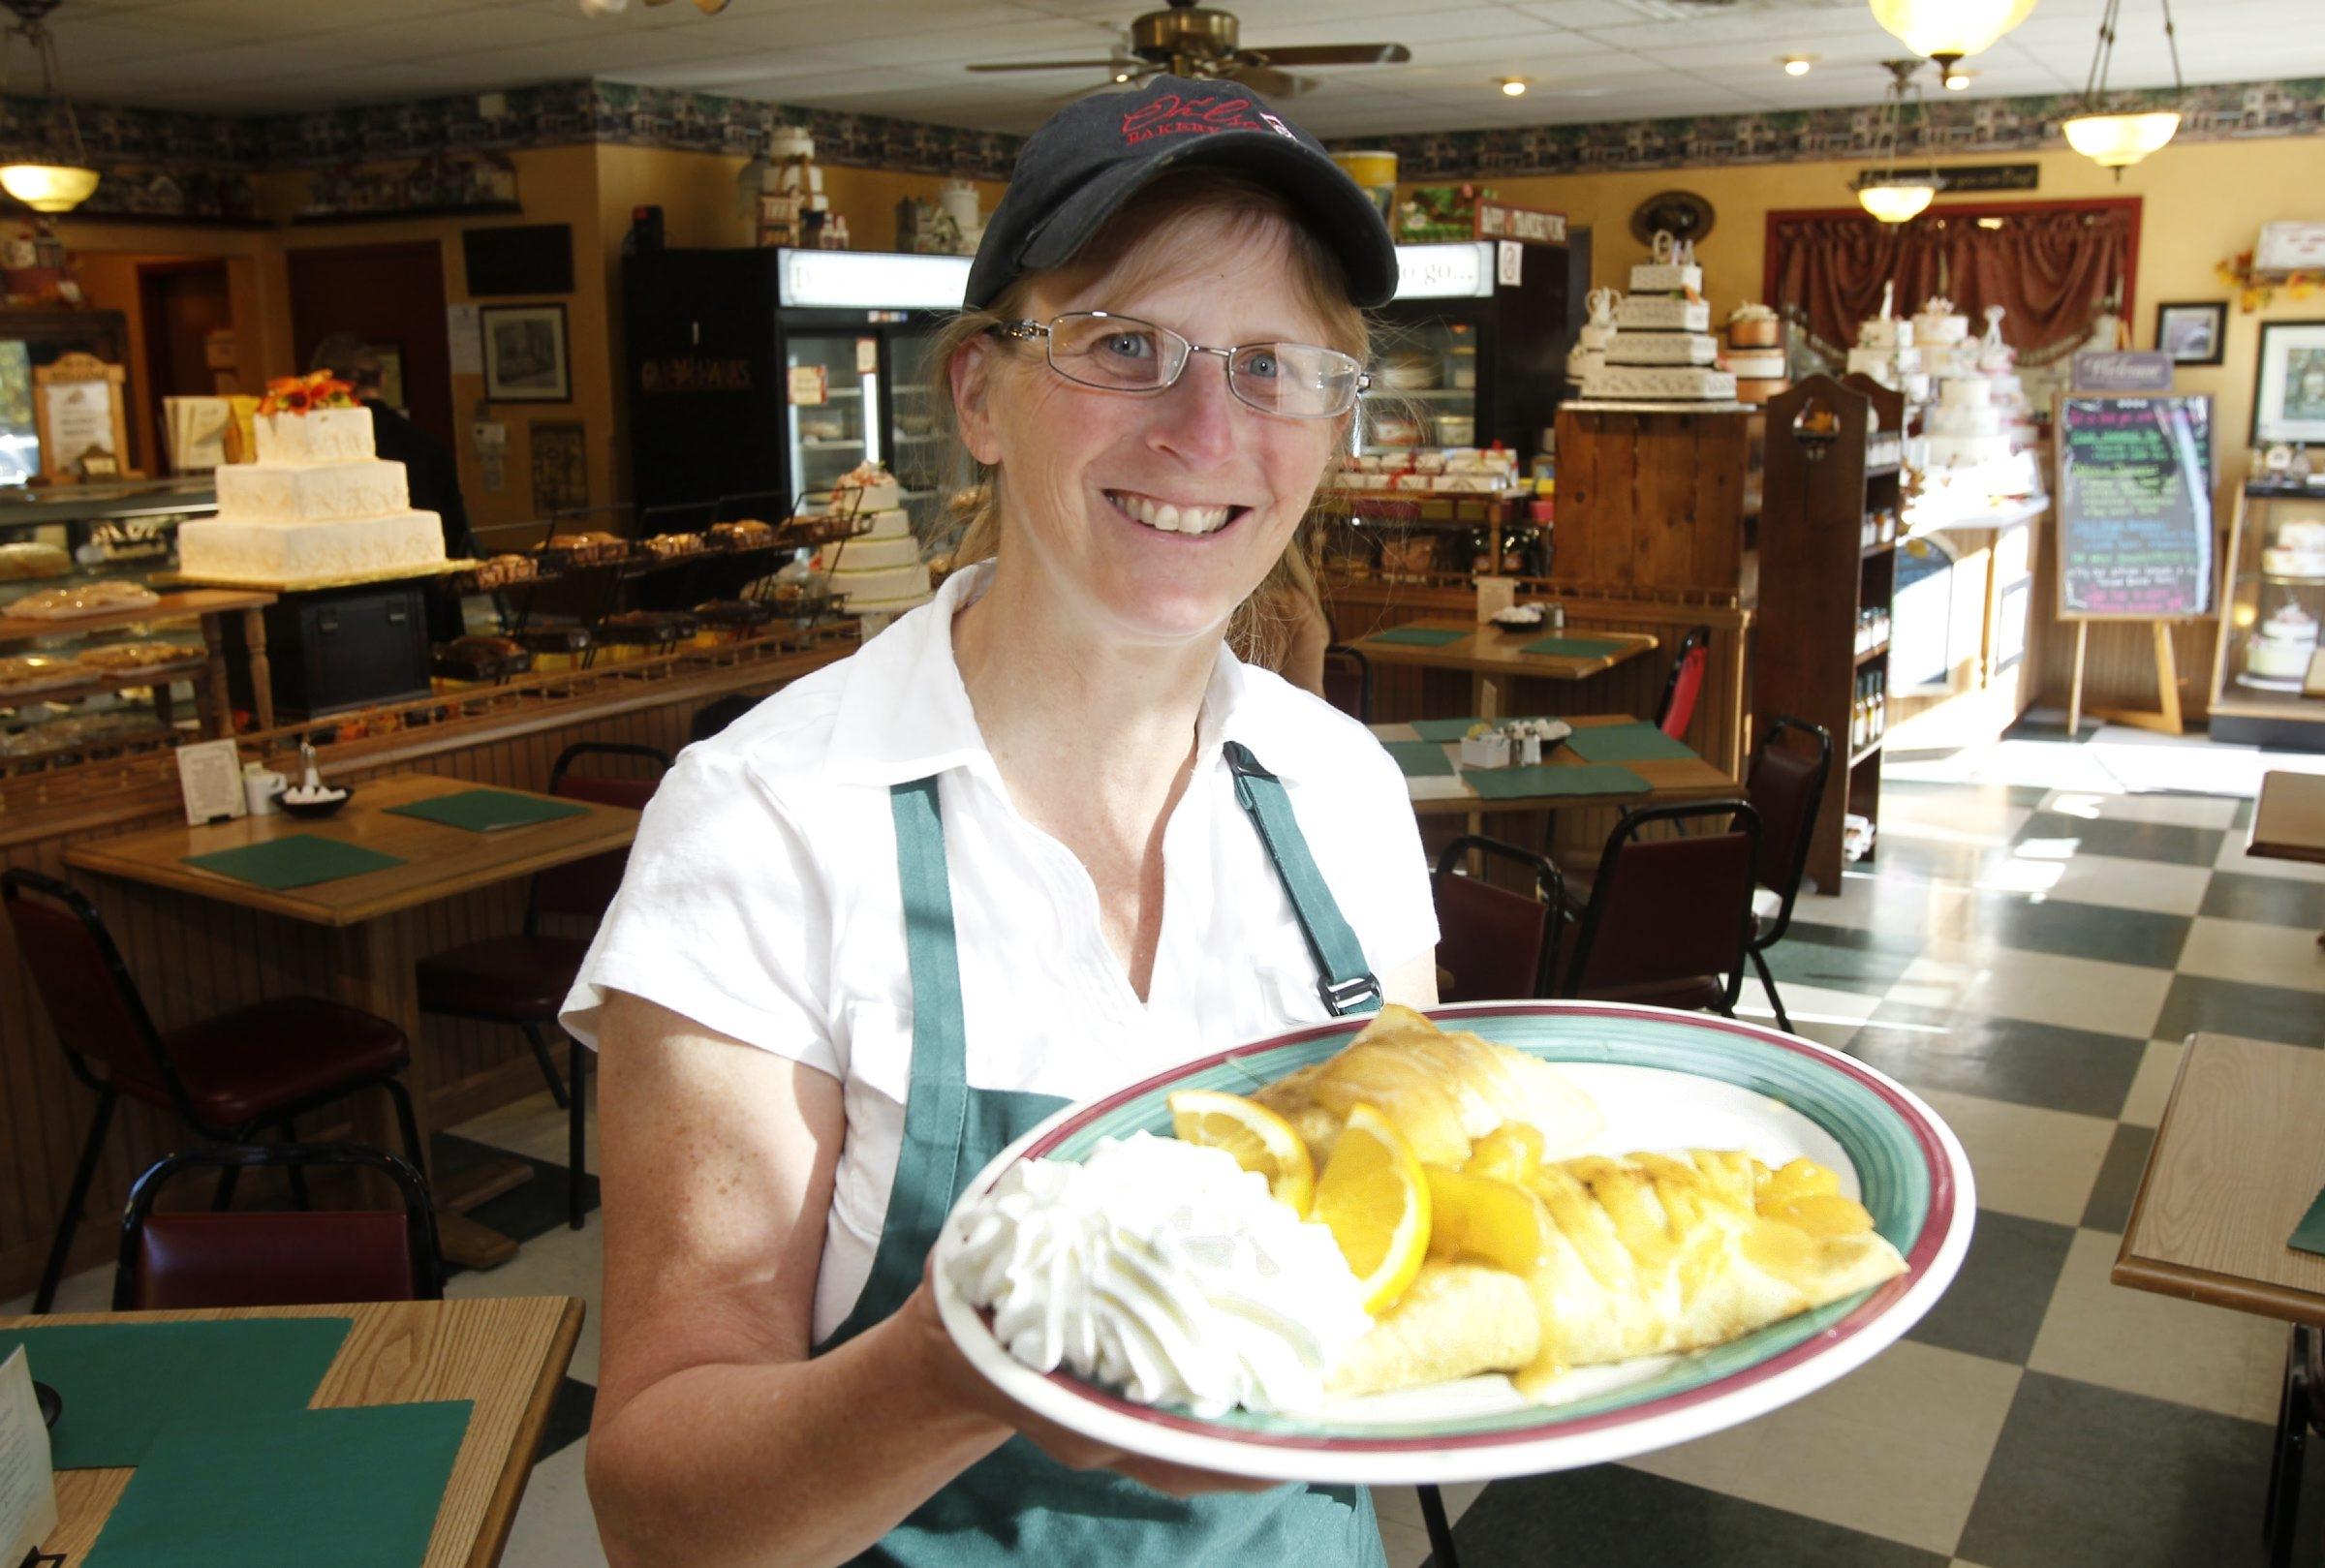 Owner Lisa Ohlson shows off an apple cinnamon crepe.